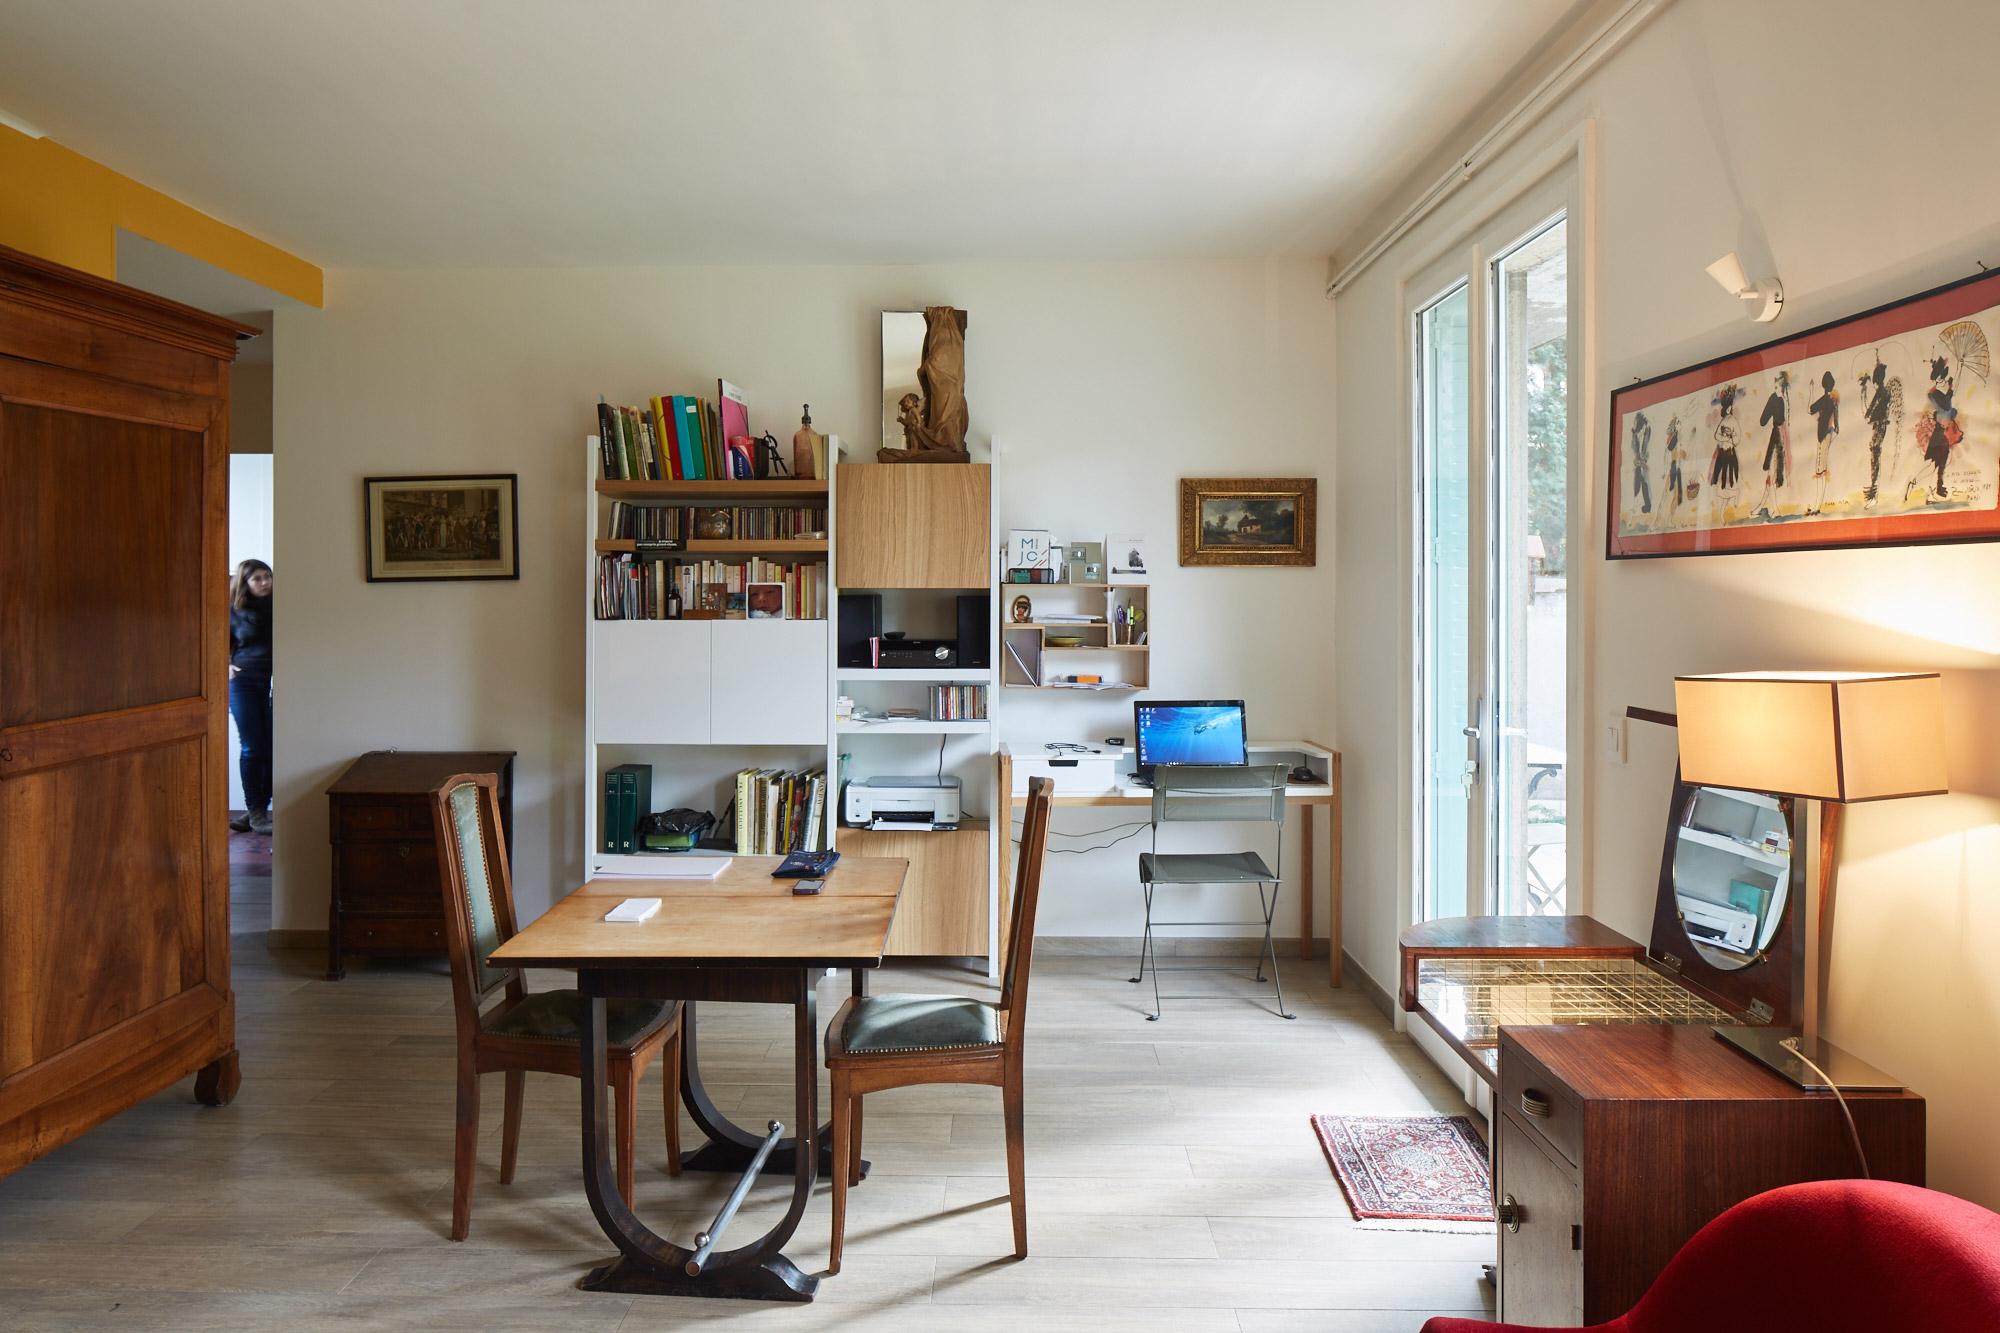 appartement bozon verduraz lyon 3. Black Bedroom Furniture Sets. Home Design Ideas